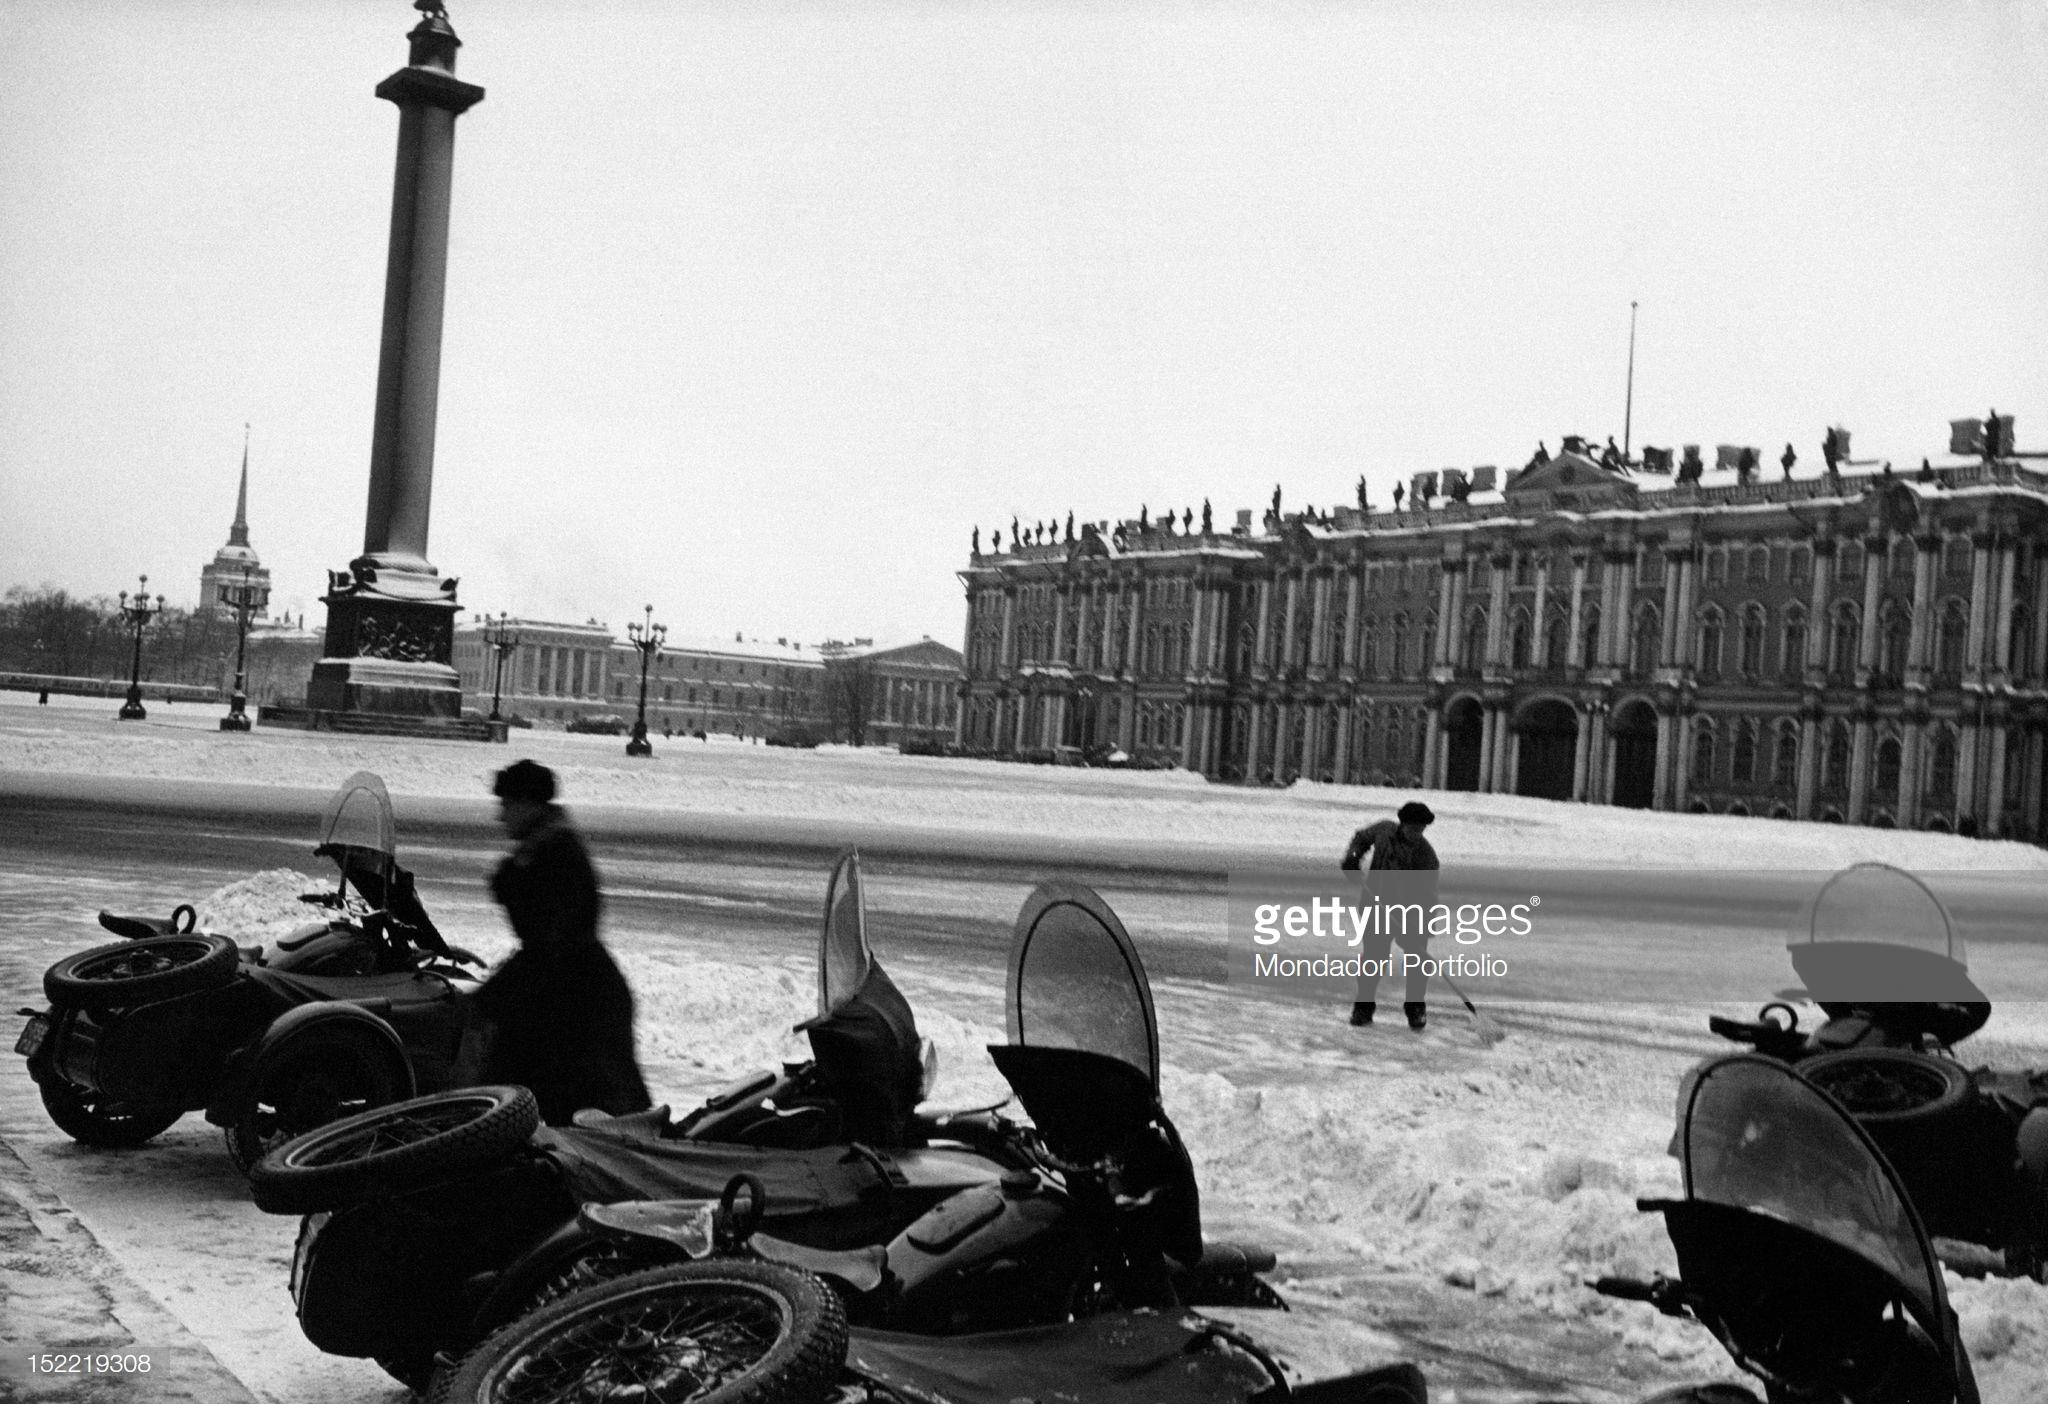 Дворцовая площадь. Уборка снега